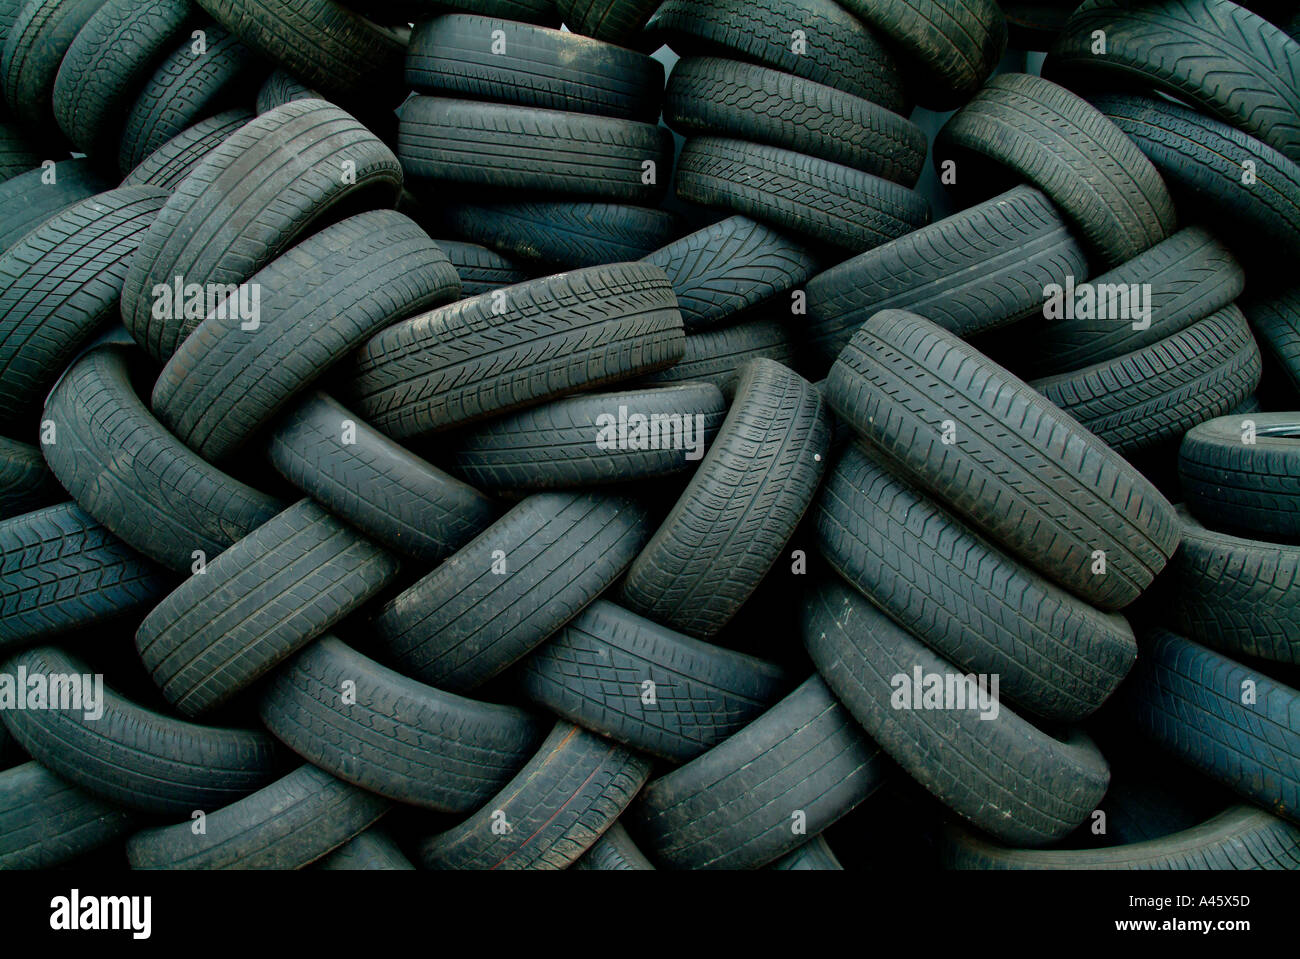 tyres stockfotos tyres bilder alamy. Black Bedroom Furniture Sets. Home Design Ideas